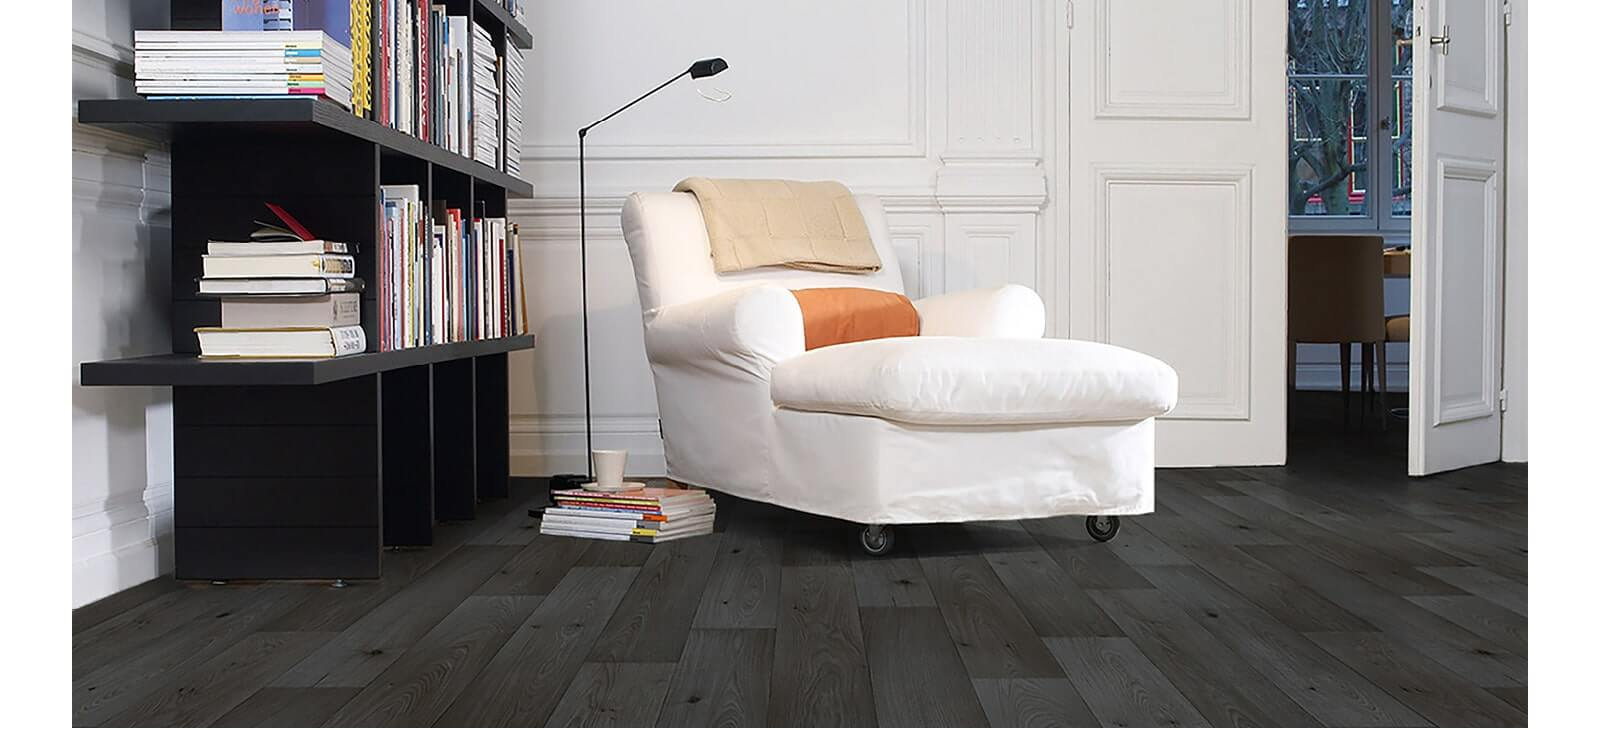 sheet vinyl living room armchair